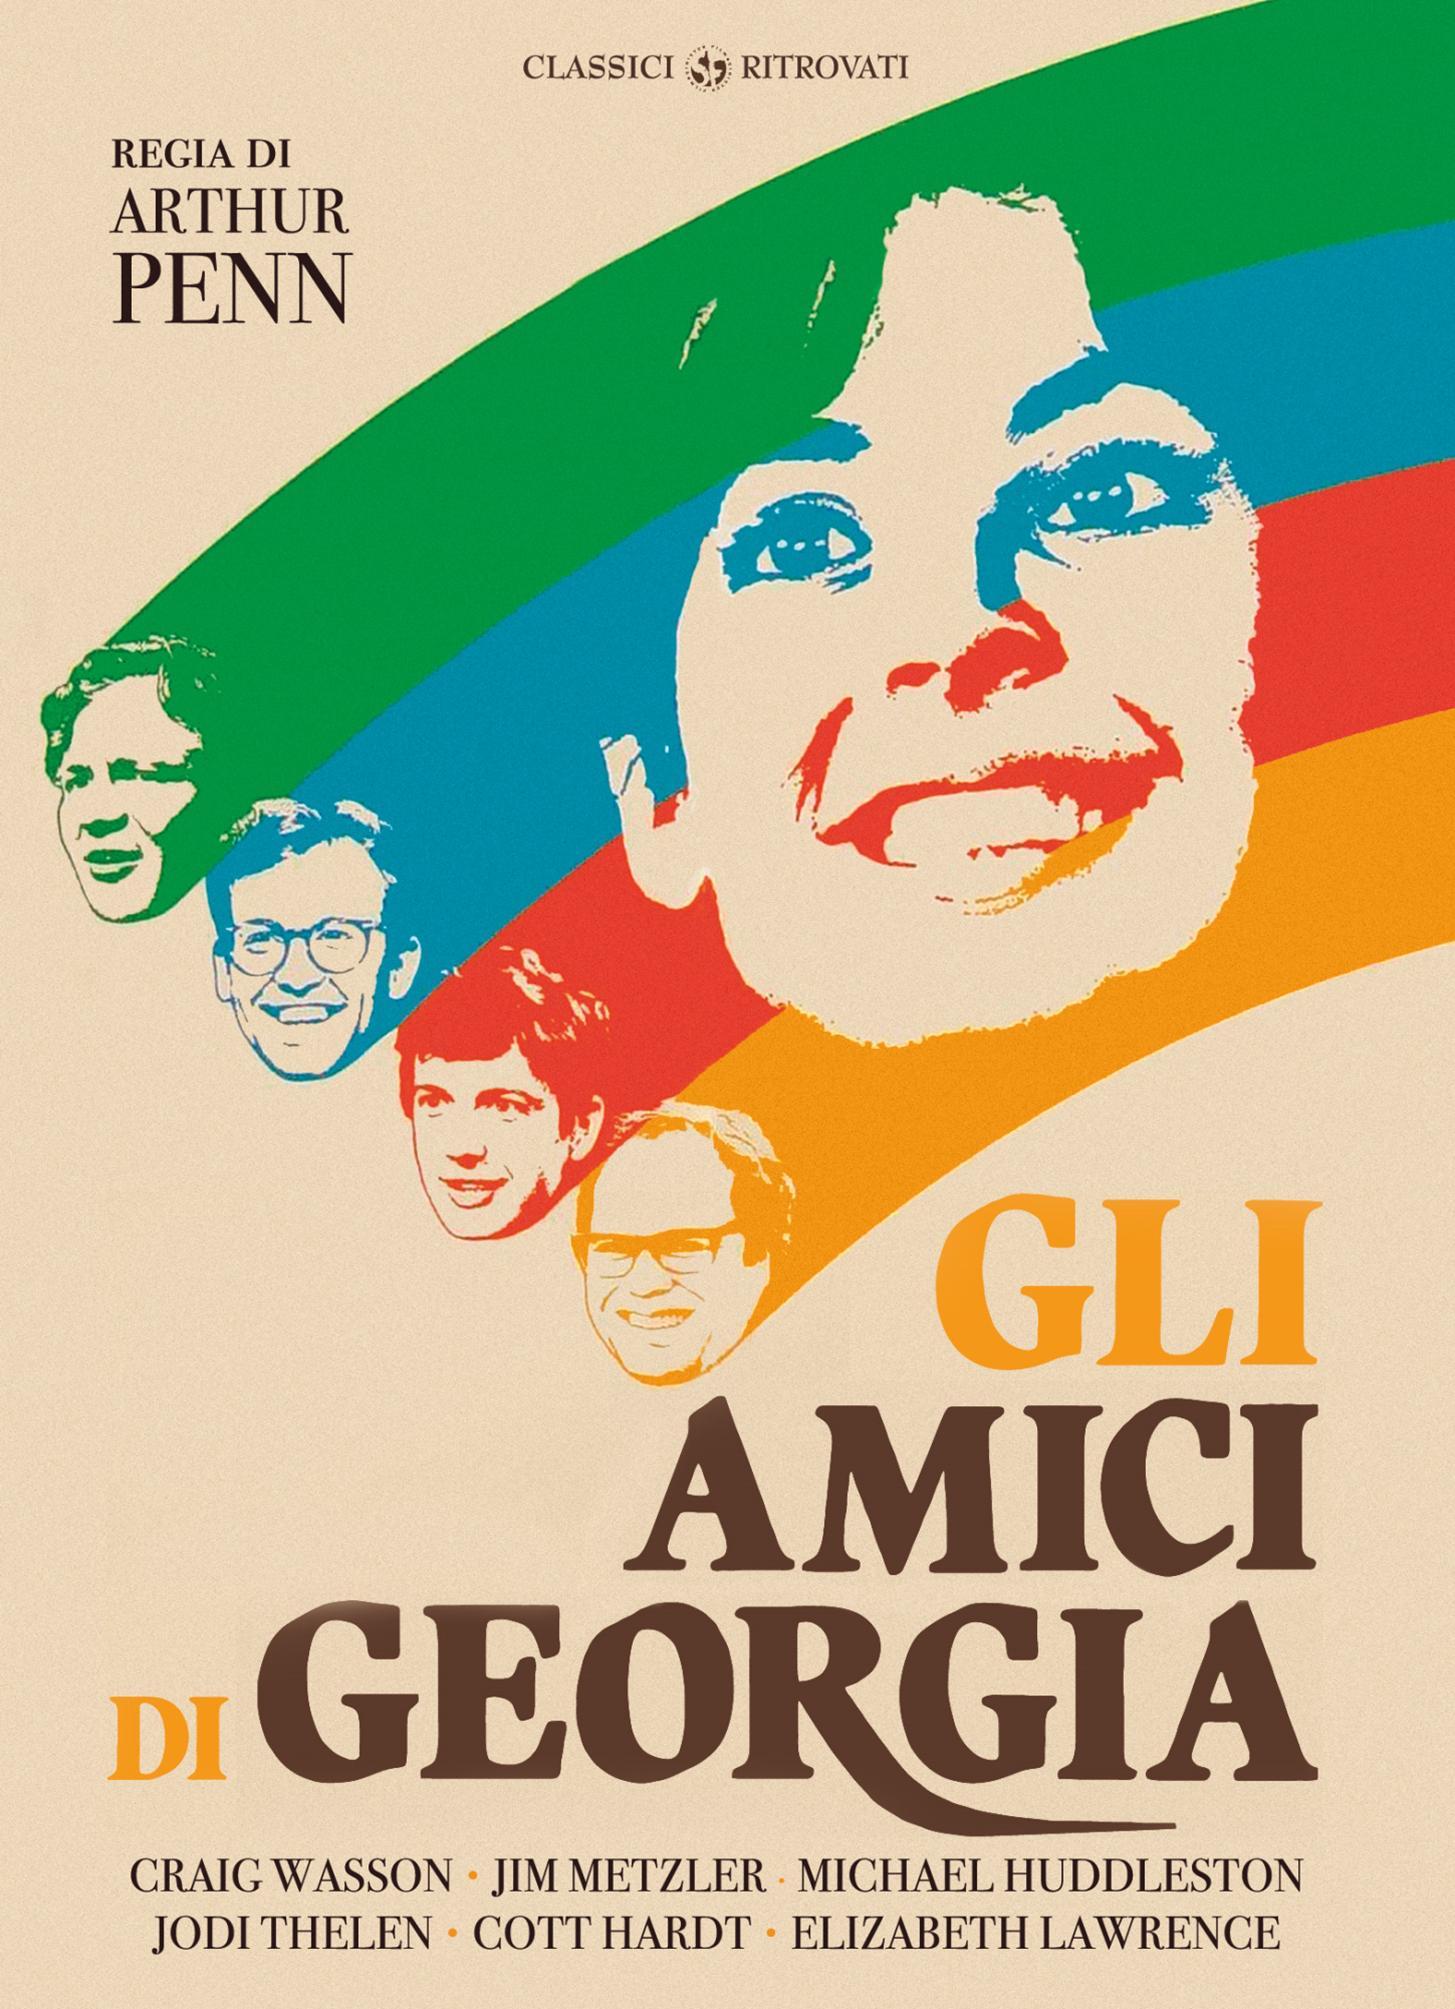 GLI AMICI DI GEORGIA (DVD)